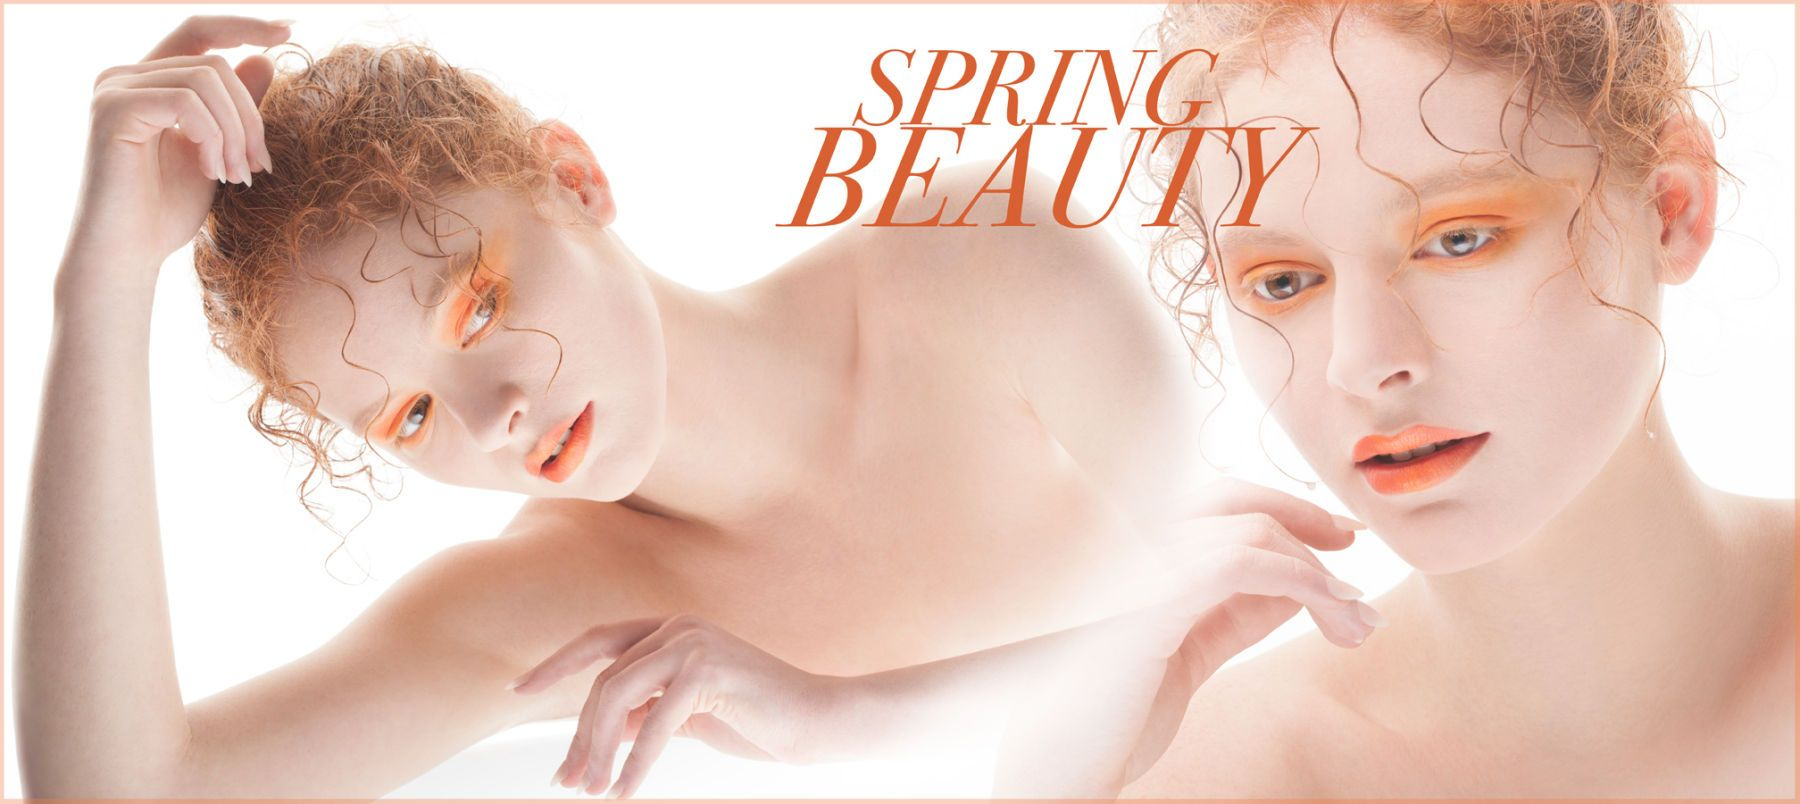 1helen_harley__spring_beauty_flat_web.jpg